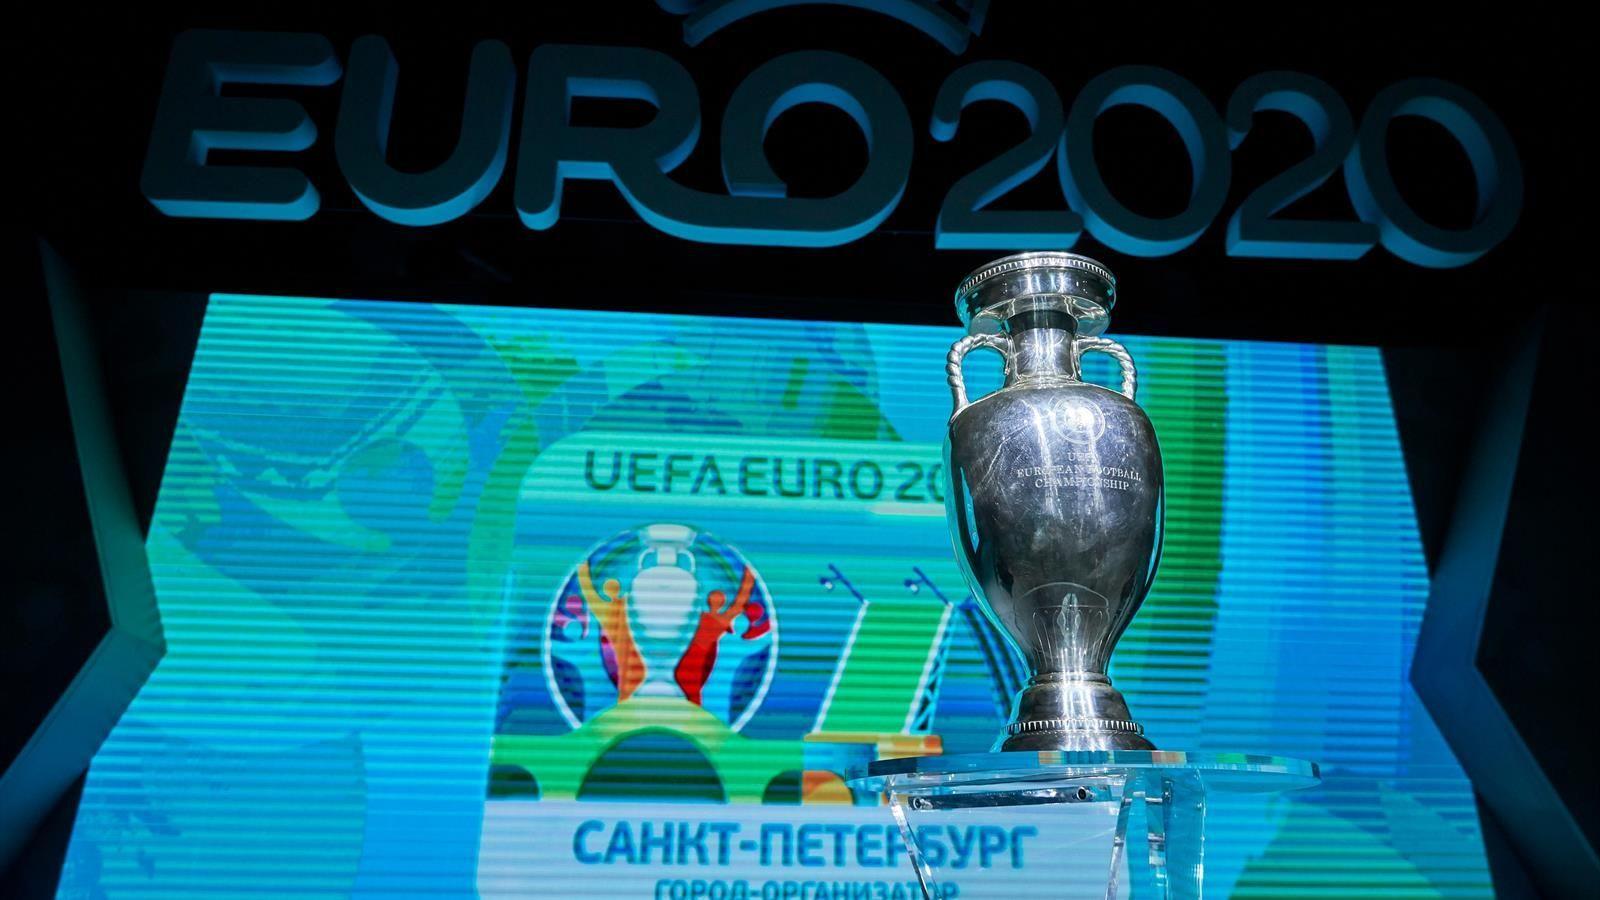 Euro 2020 HD Wallpapers - Wallpaper Cave